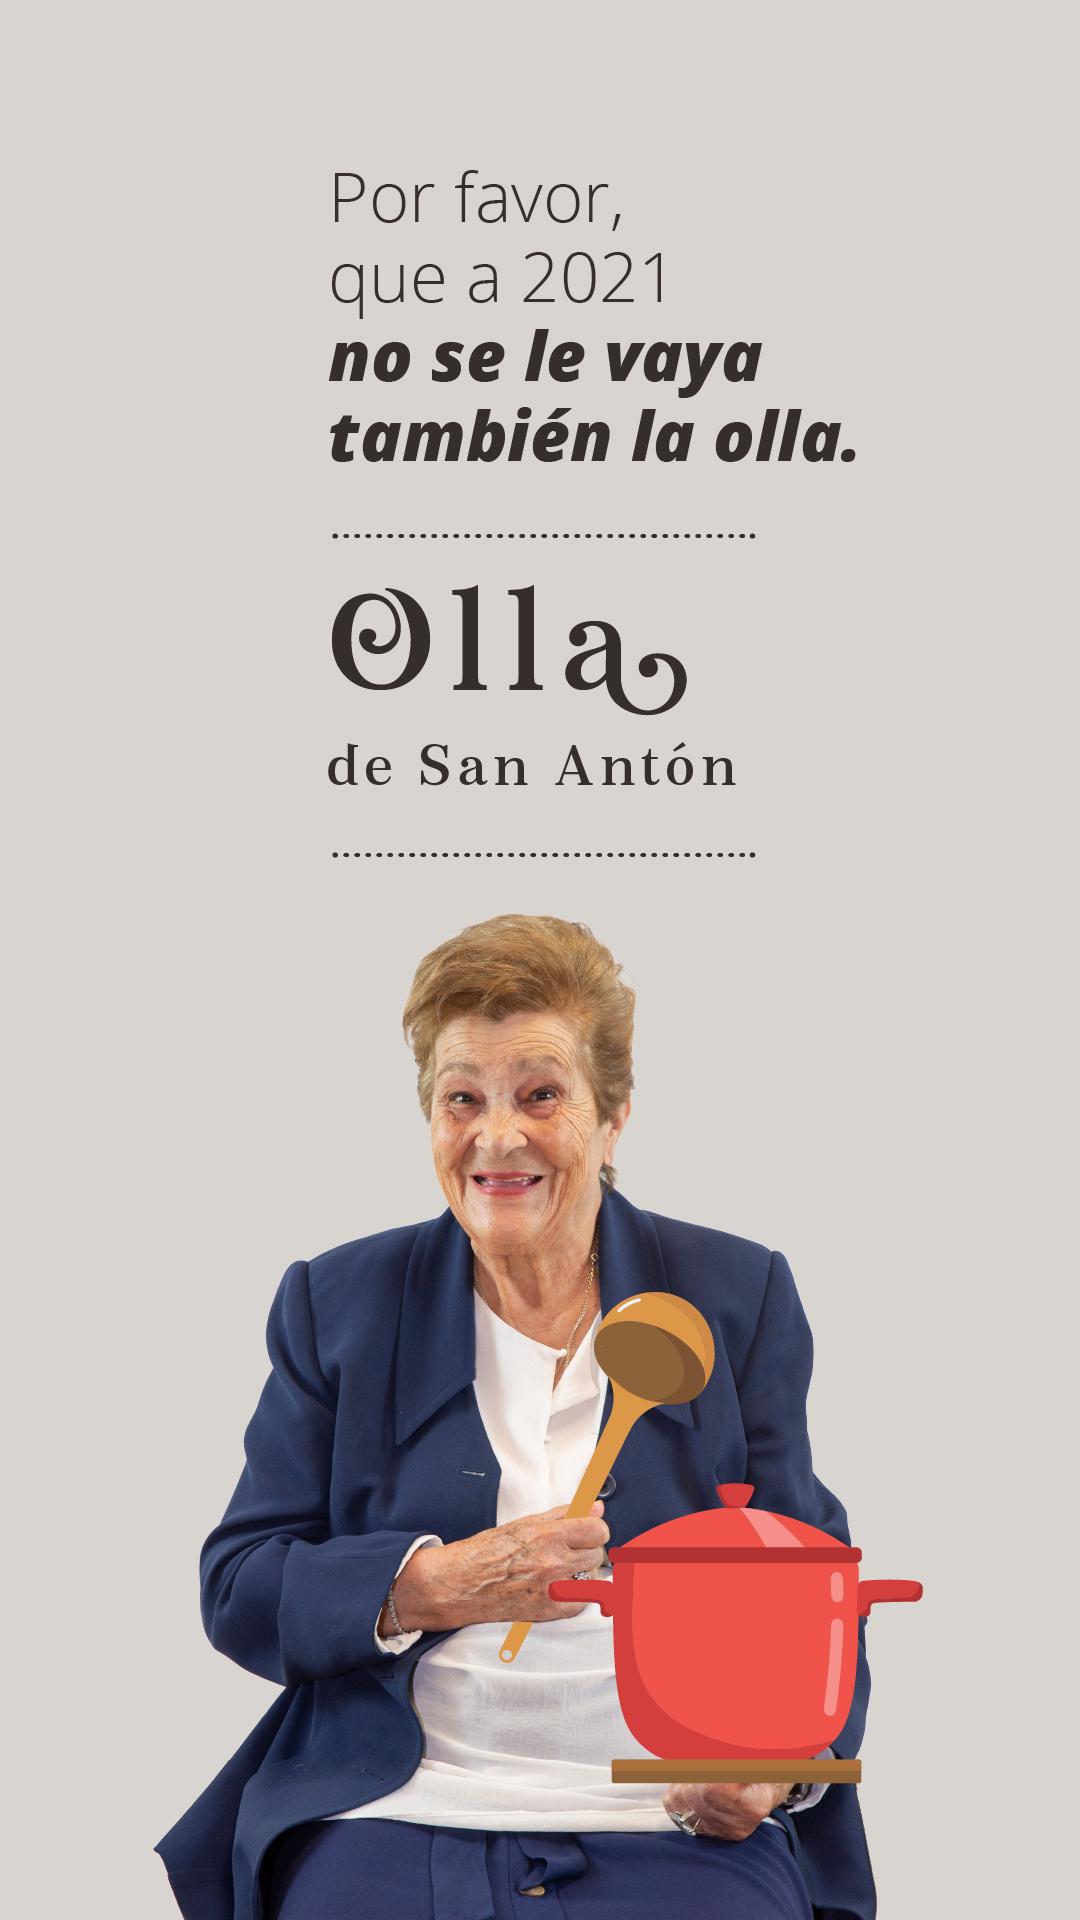 OLLA DE SAN ANTON